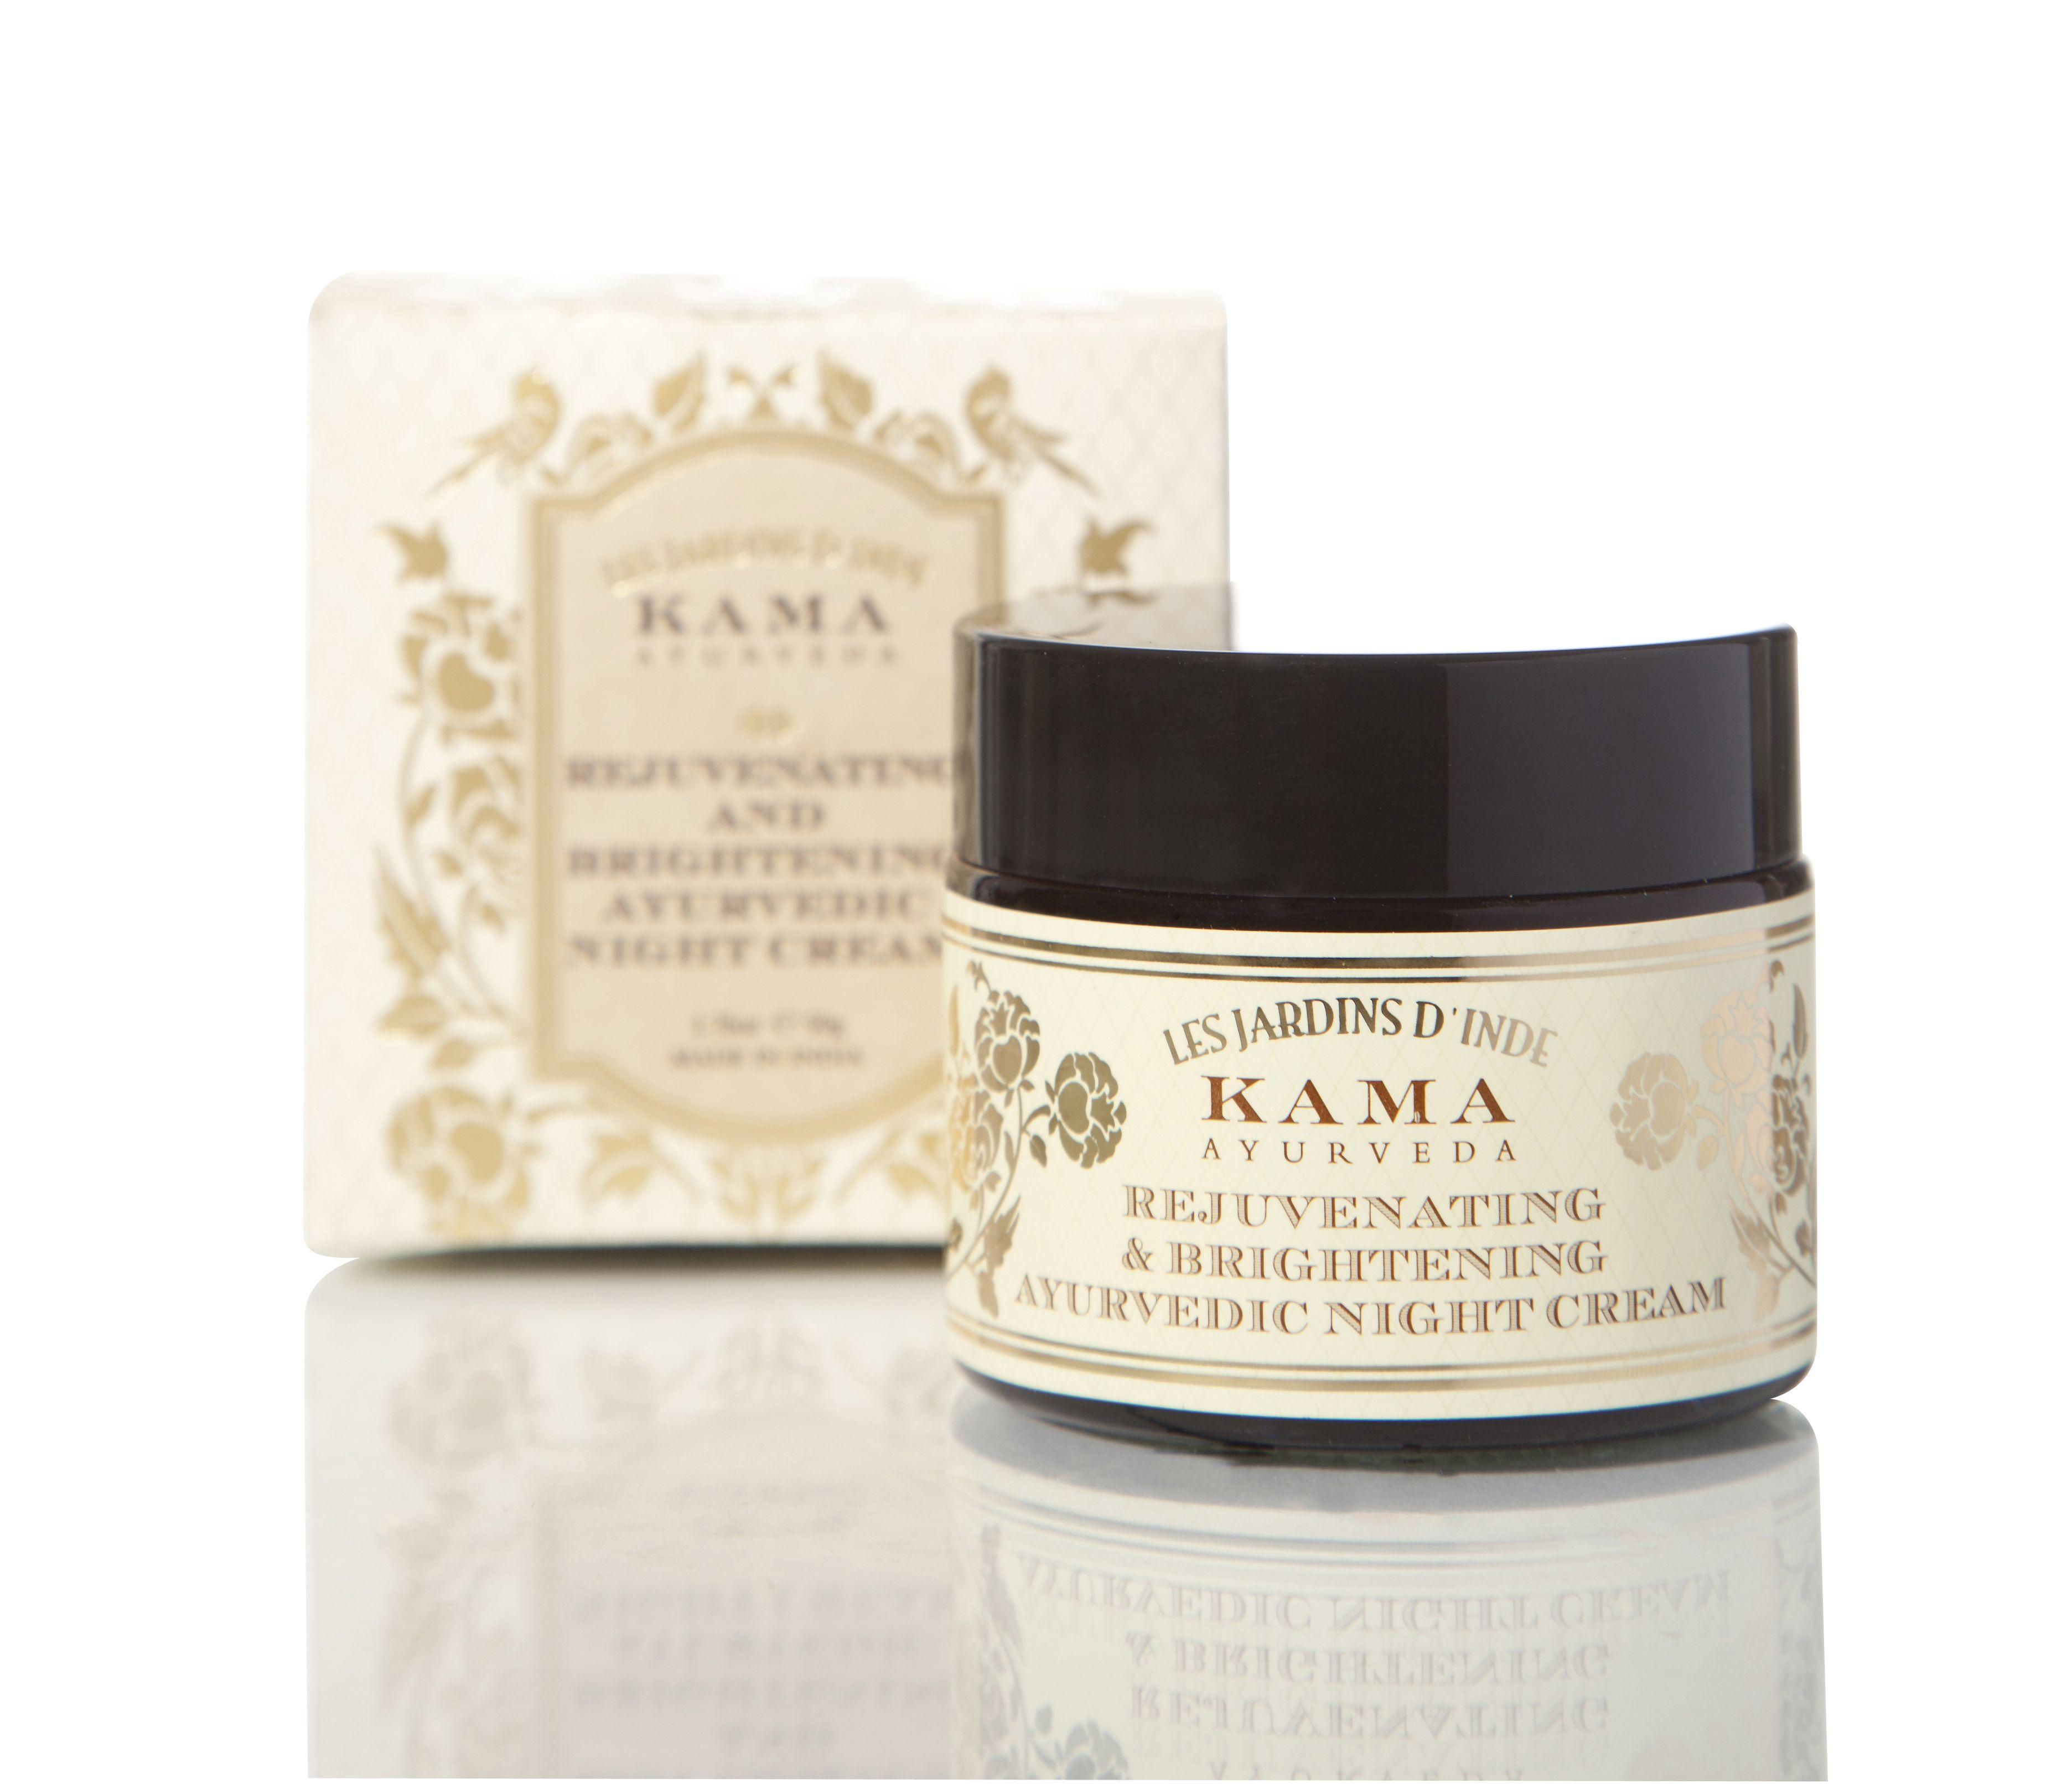 Kama Ayurveda Rejuvenating And Brightening Ayurvedic Night Cream